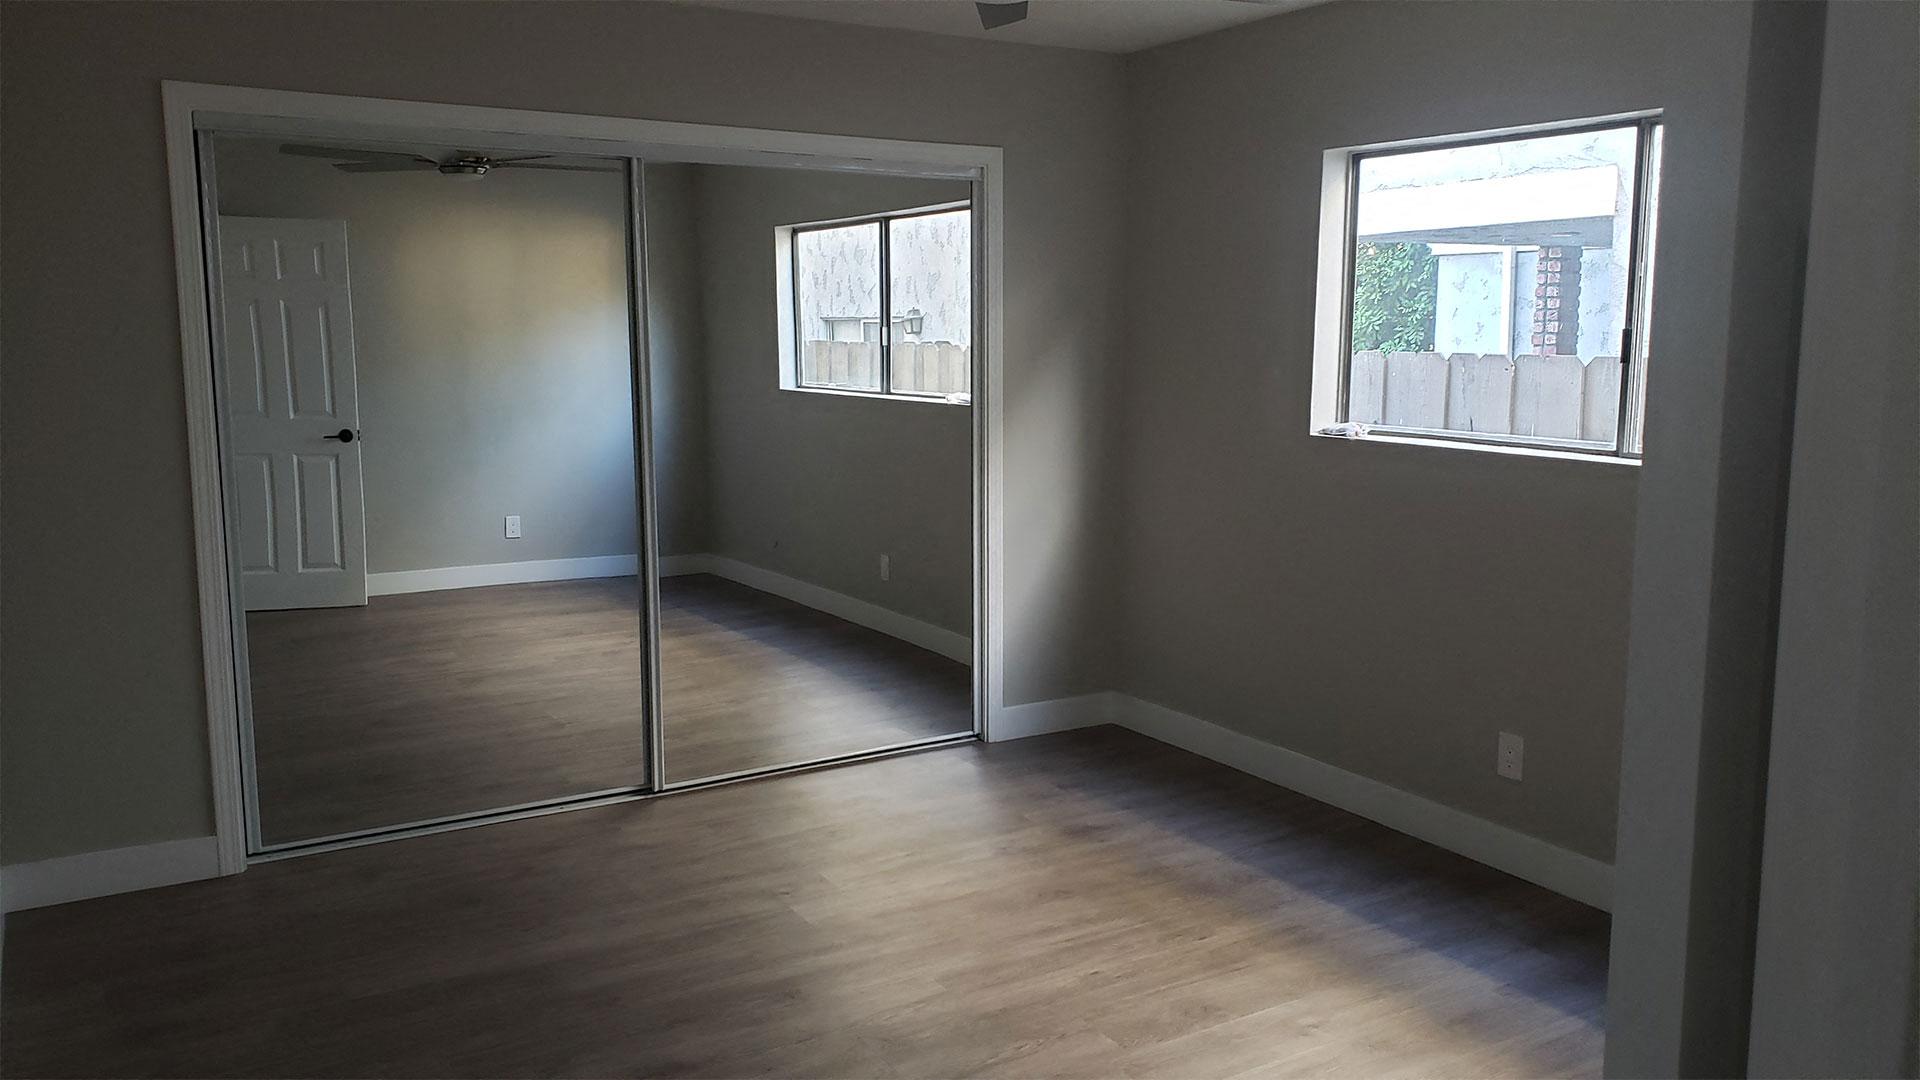 Sliding Door Closet with Mirror in Bedroom at Wilson Apartments in Glendale, CA